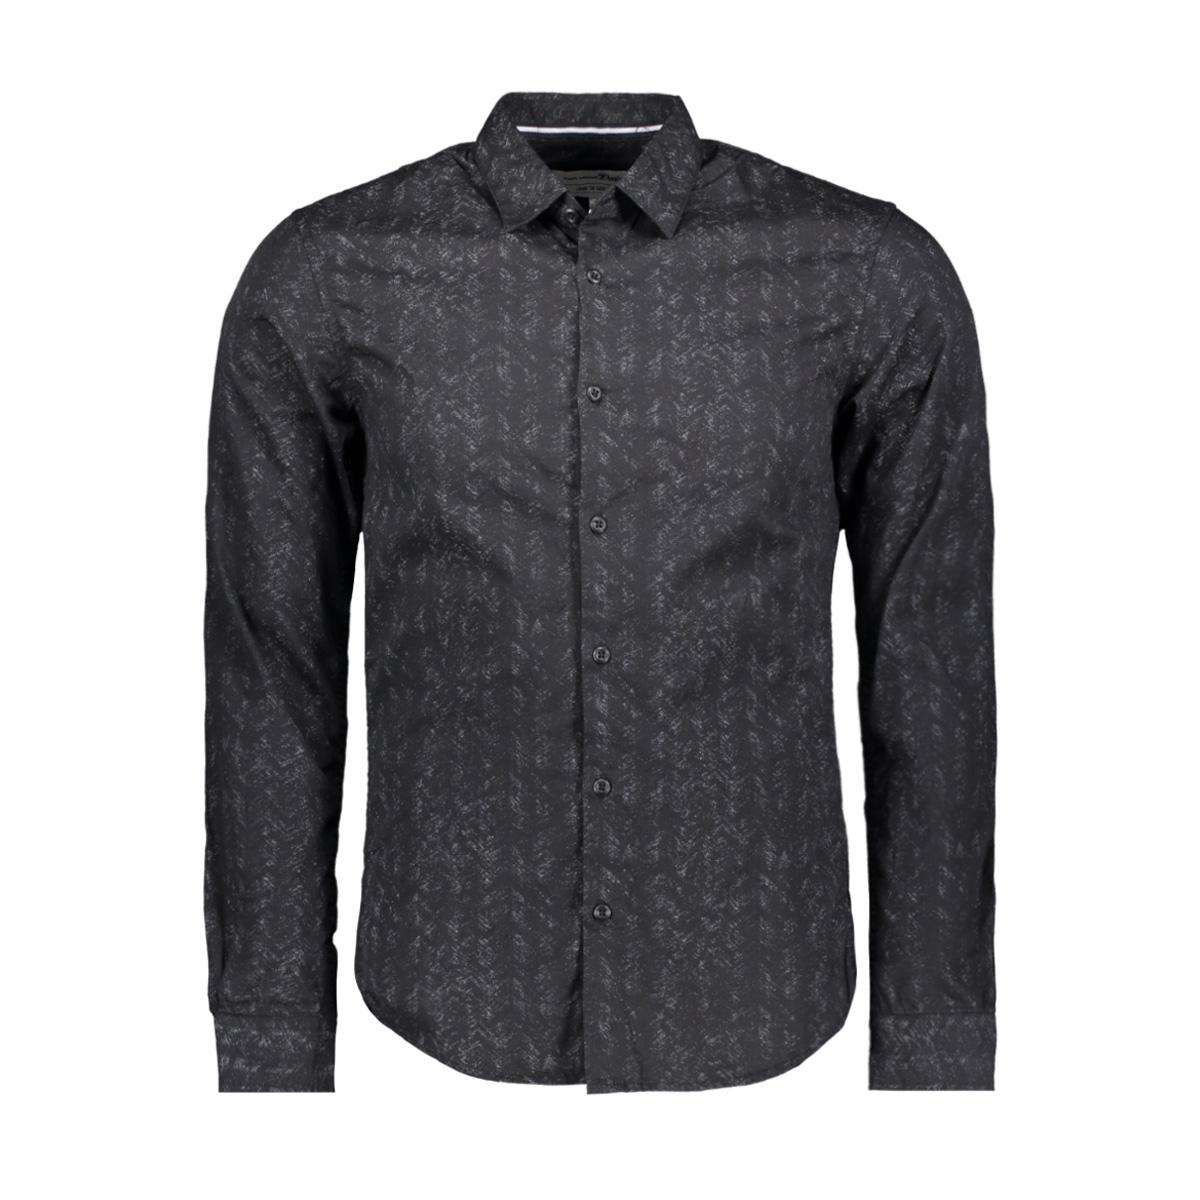 1007066xx12 tom tailor overhemd 14971